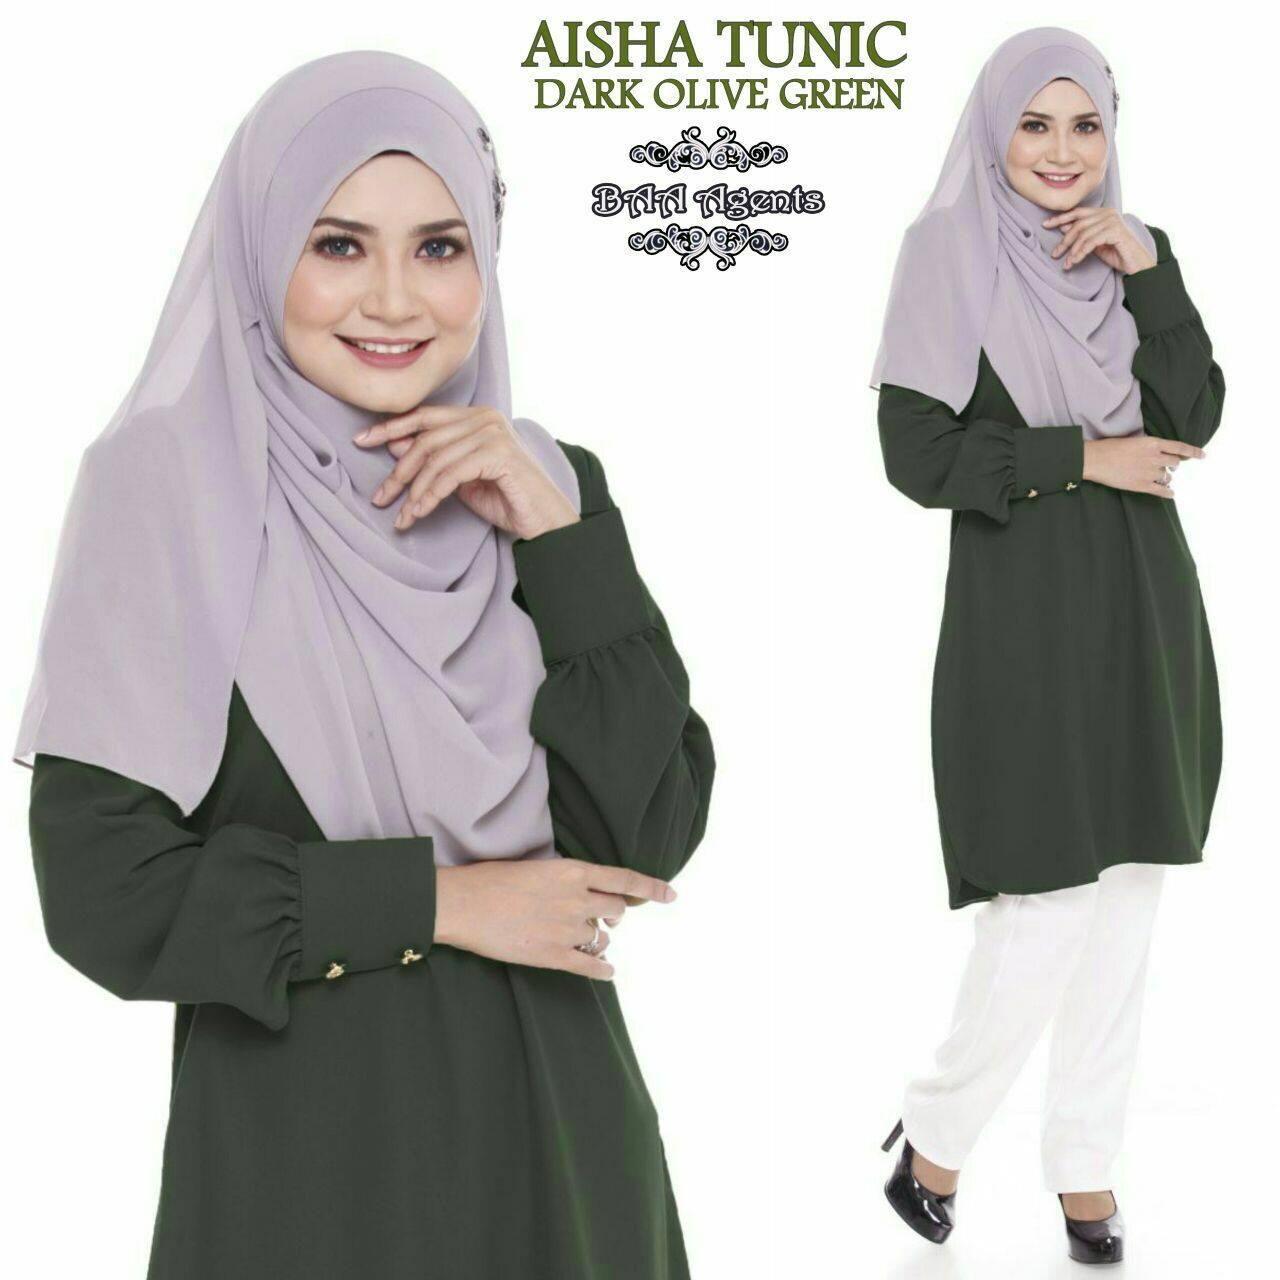 TUNIC MUSLIMAH AISHA DARK OLIVE GREEN